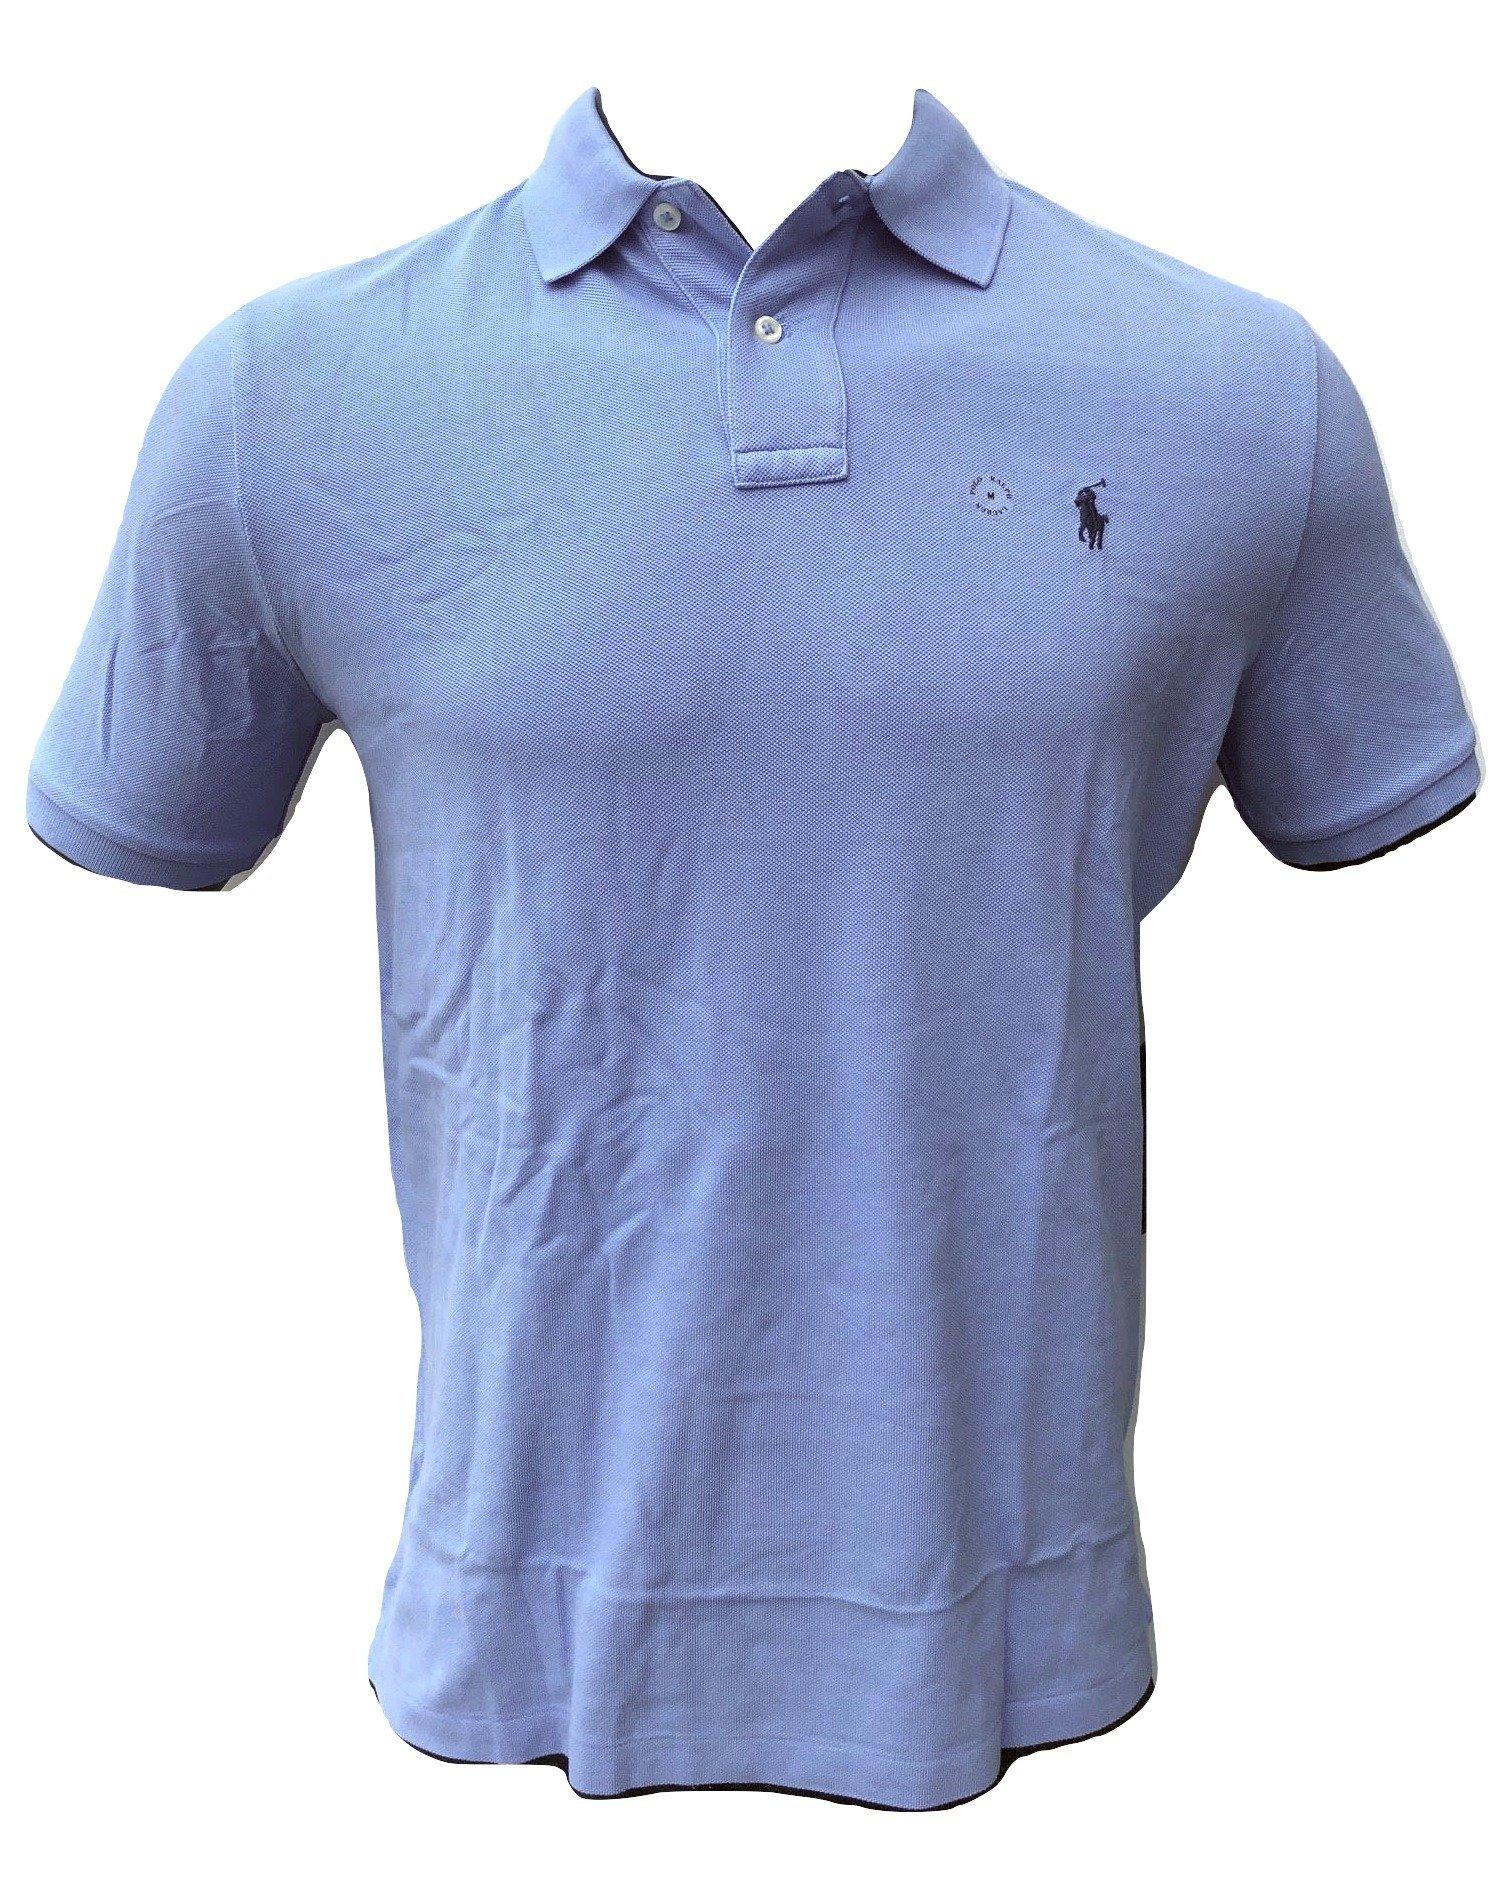 Polo Ralph Lauren Mens Classic Fit Mesh Polo Shirt (Blue New Harbour, Medium)